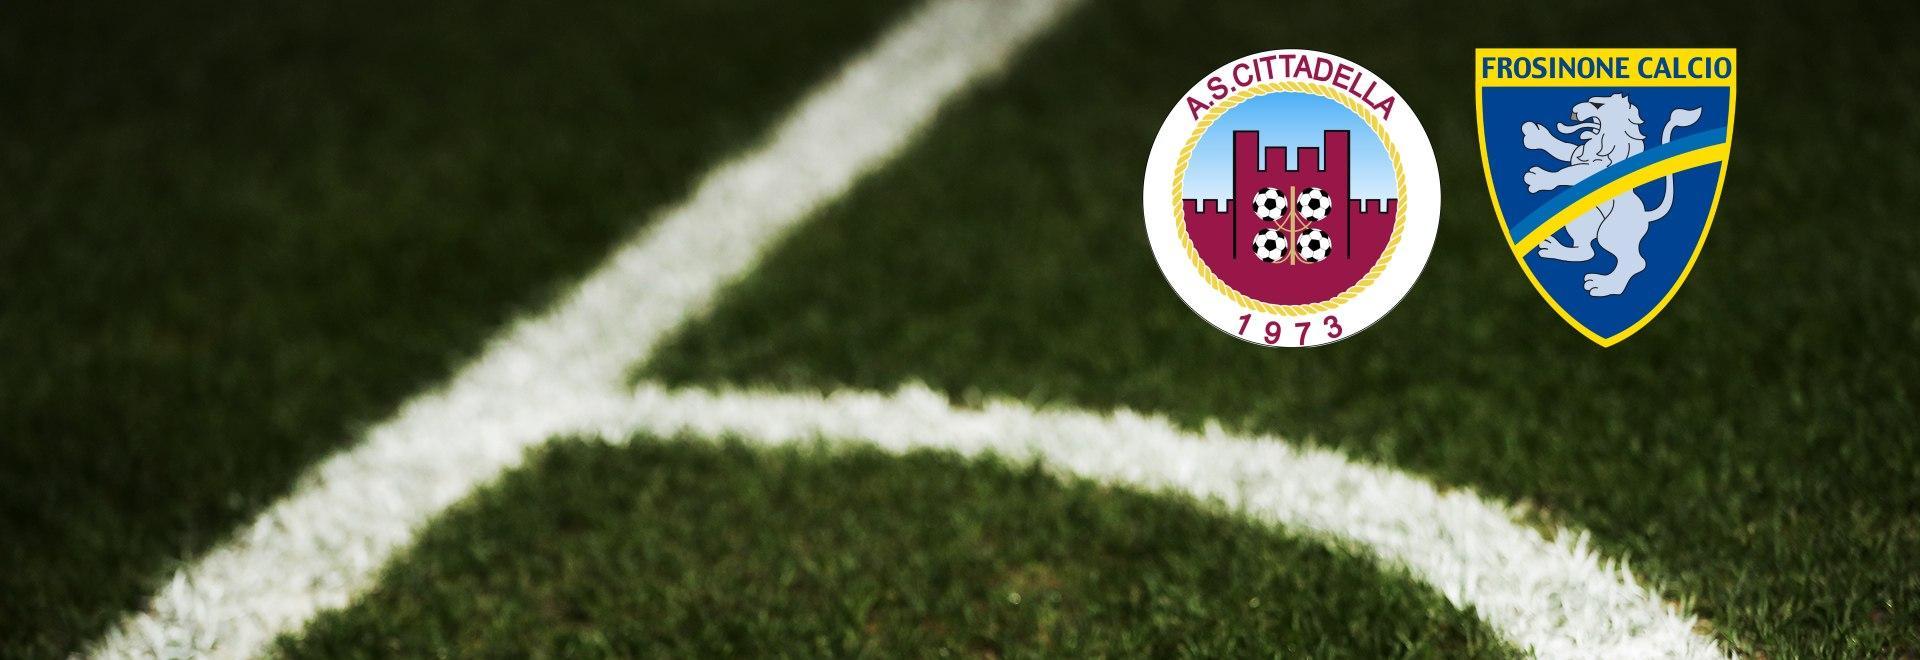 Cittadella - Frosinone. Playoff